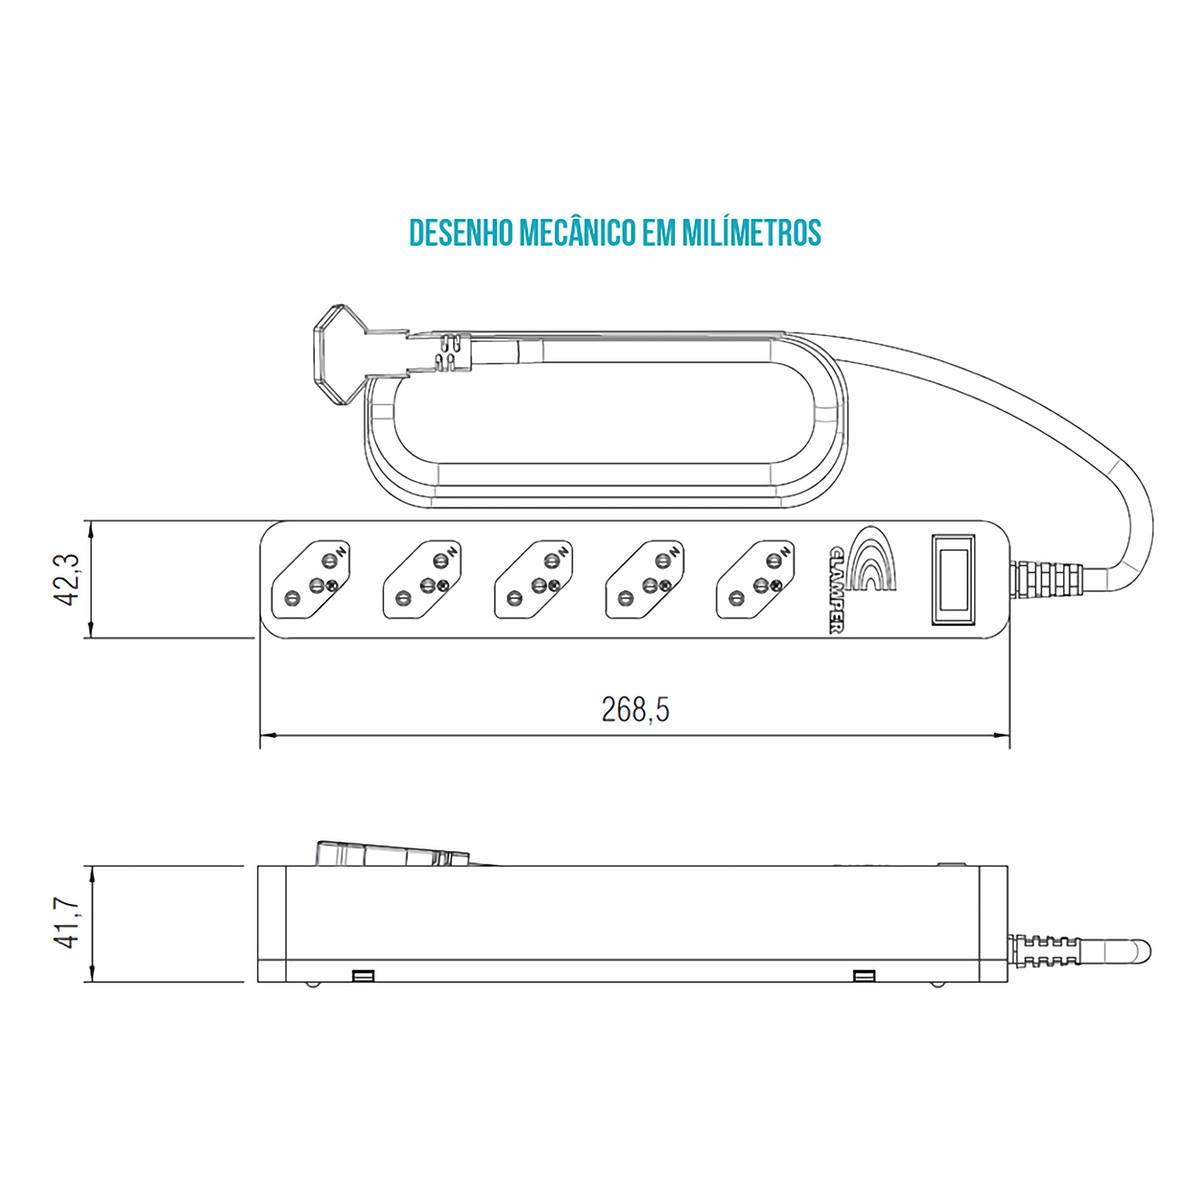 iClamper DPS Energia 5 + Filtro de Linha Bivolt 5 Tomadas Protege contra Sobrecargas e Surtos Elétricos Clamper Preto